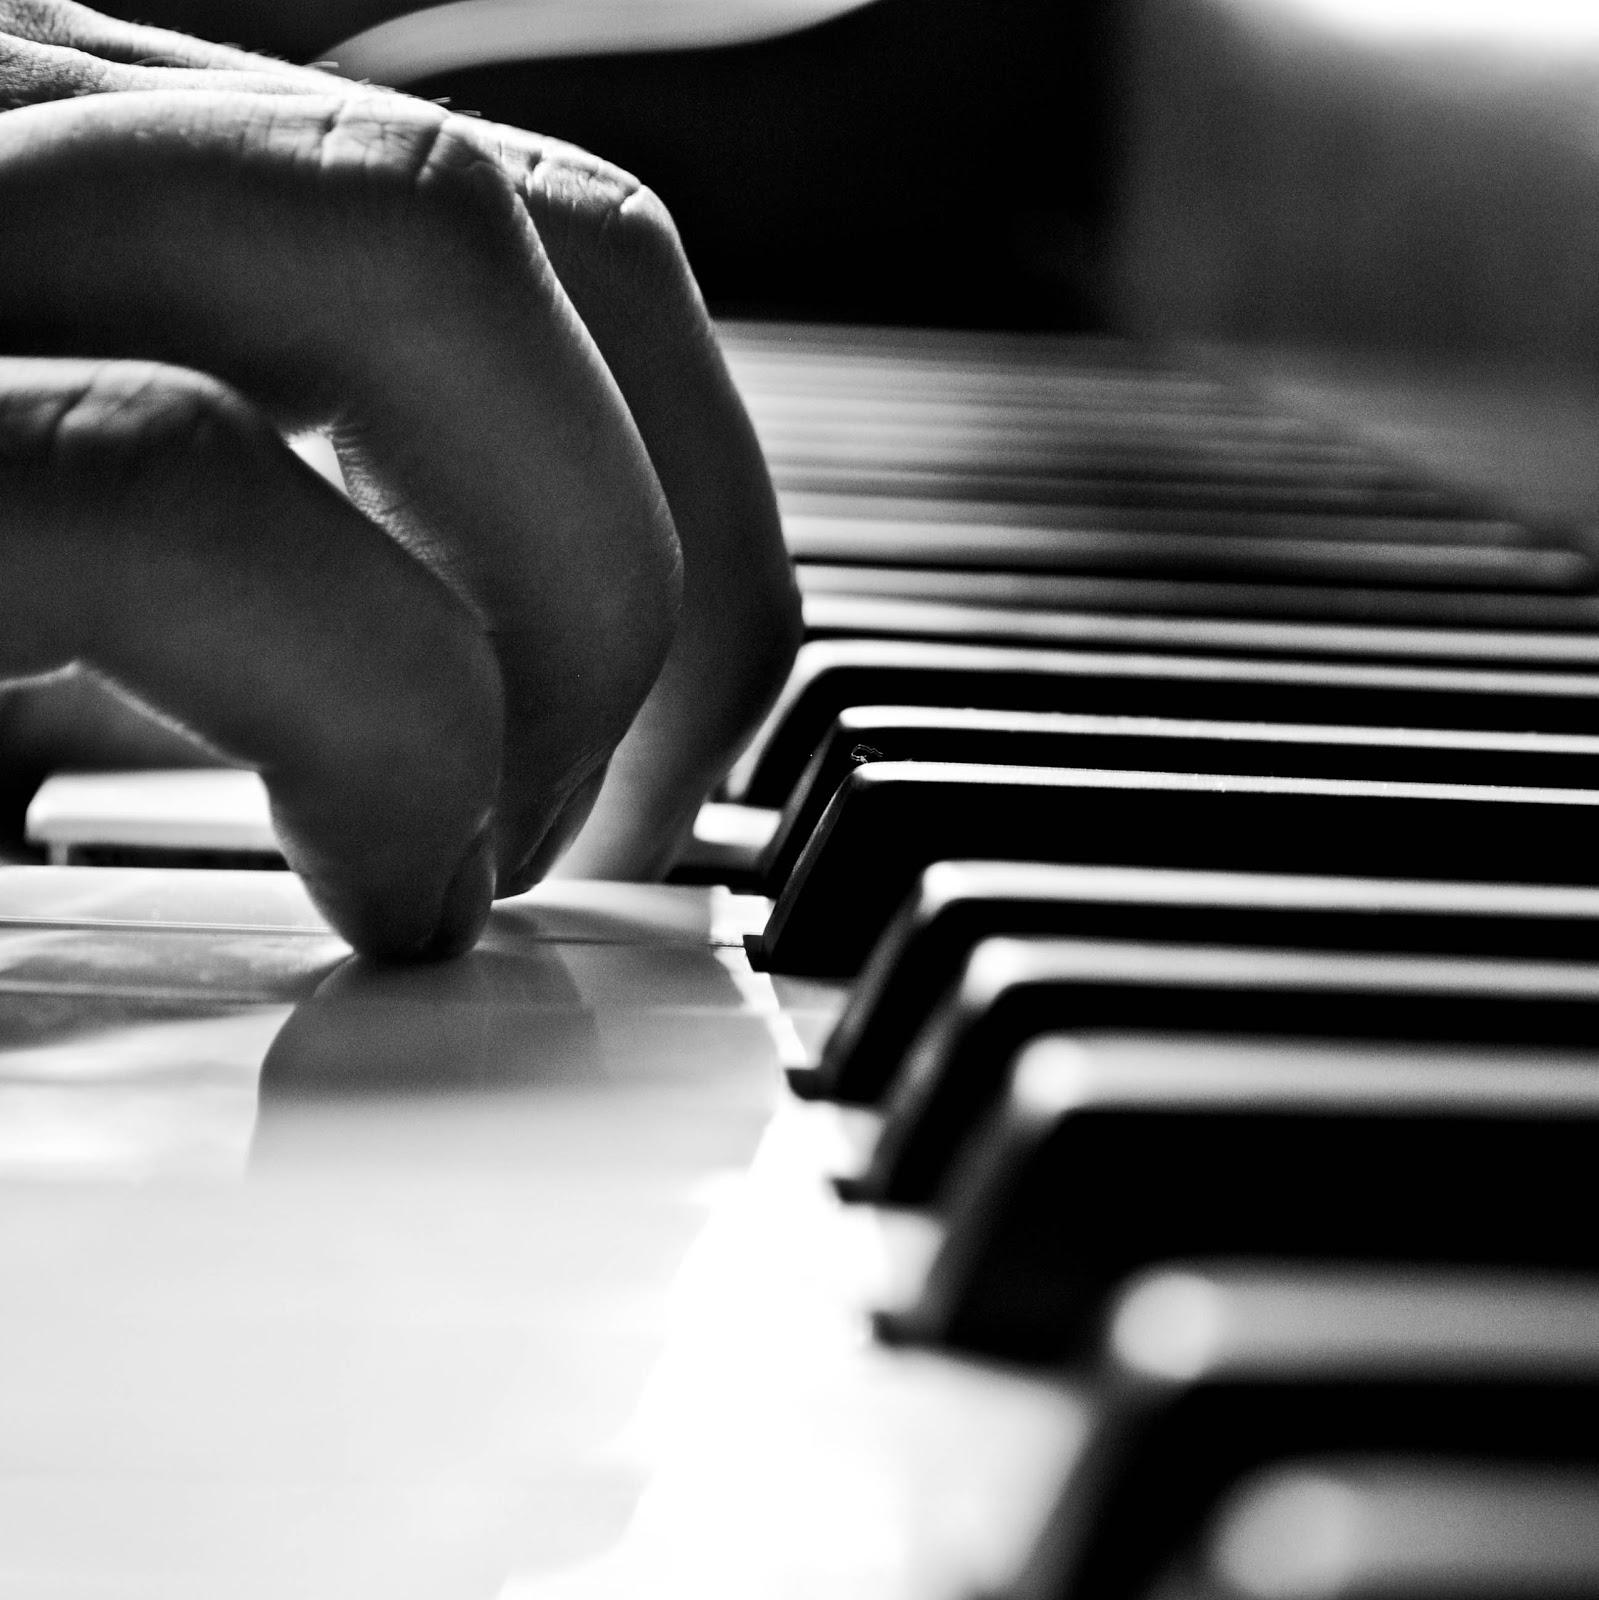 billy joel playing piano - photo #31